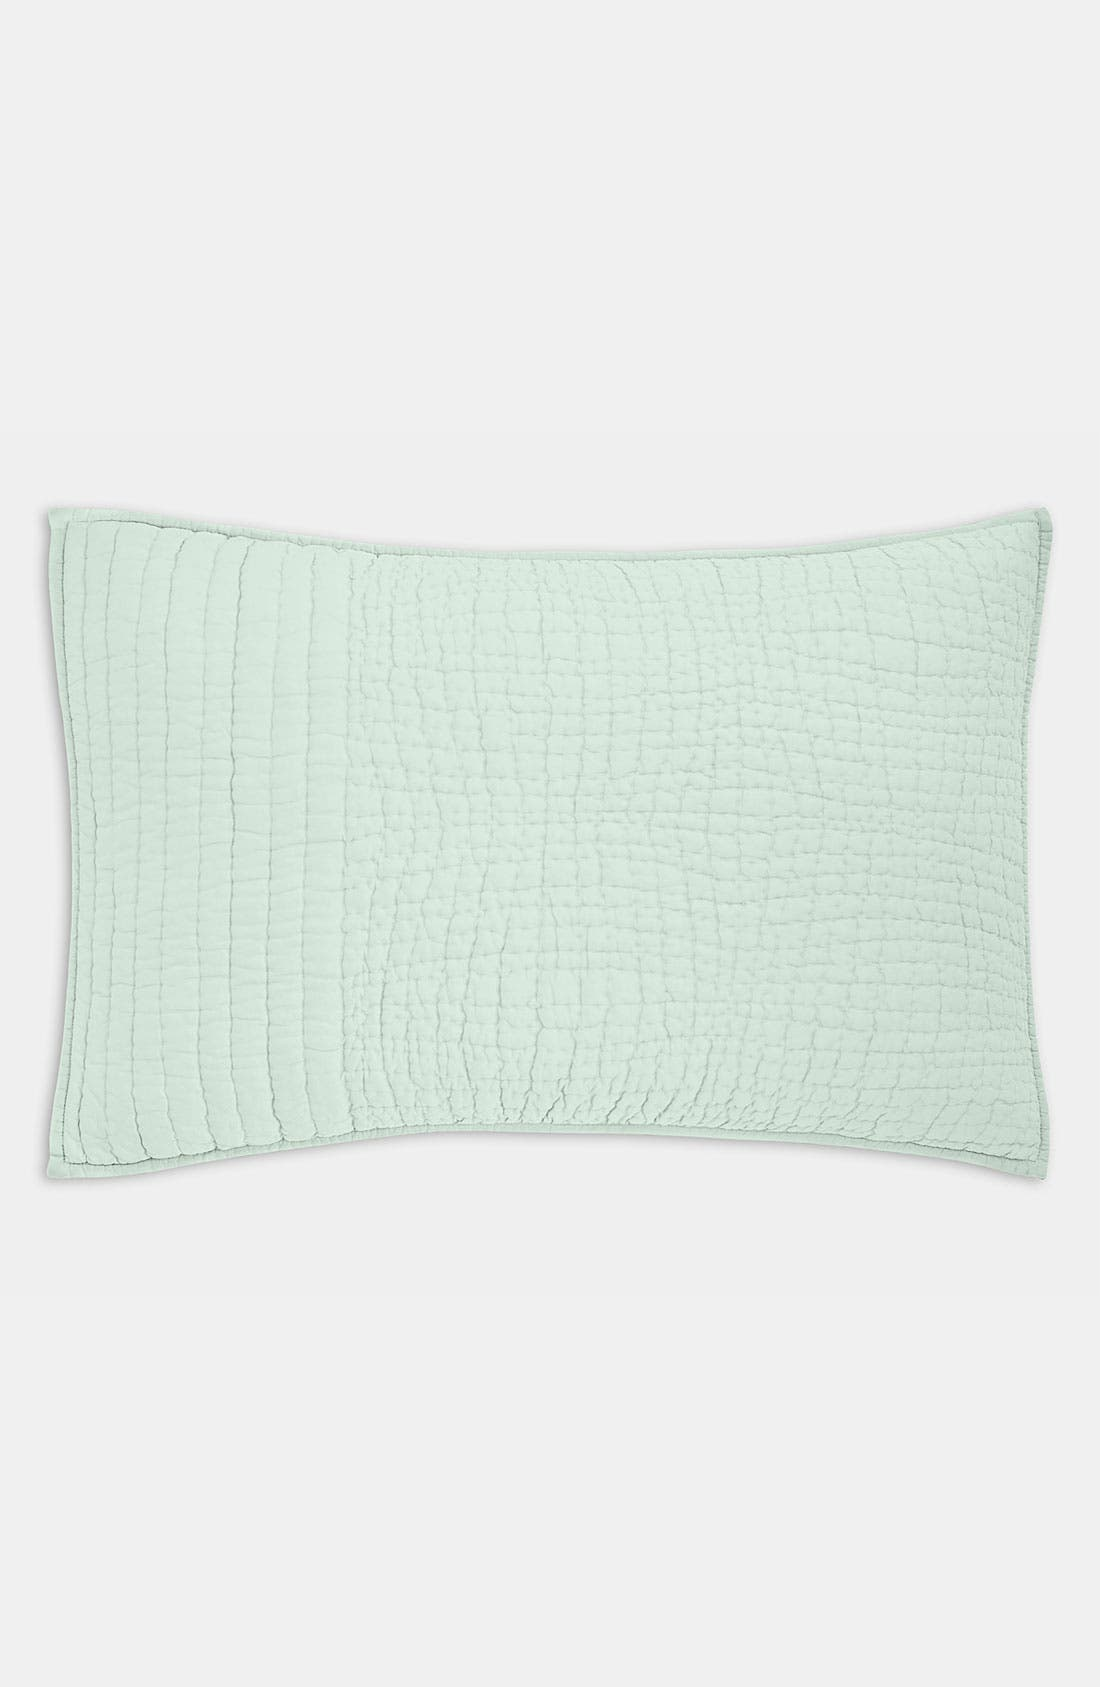 Alternate Image 1 Selected - Donna Karan Puckered Stitch Pillow Sham